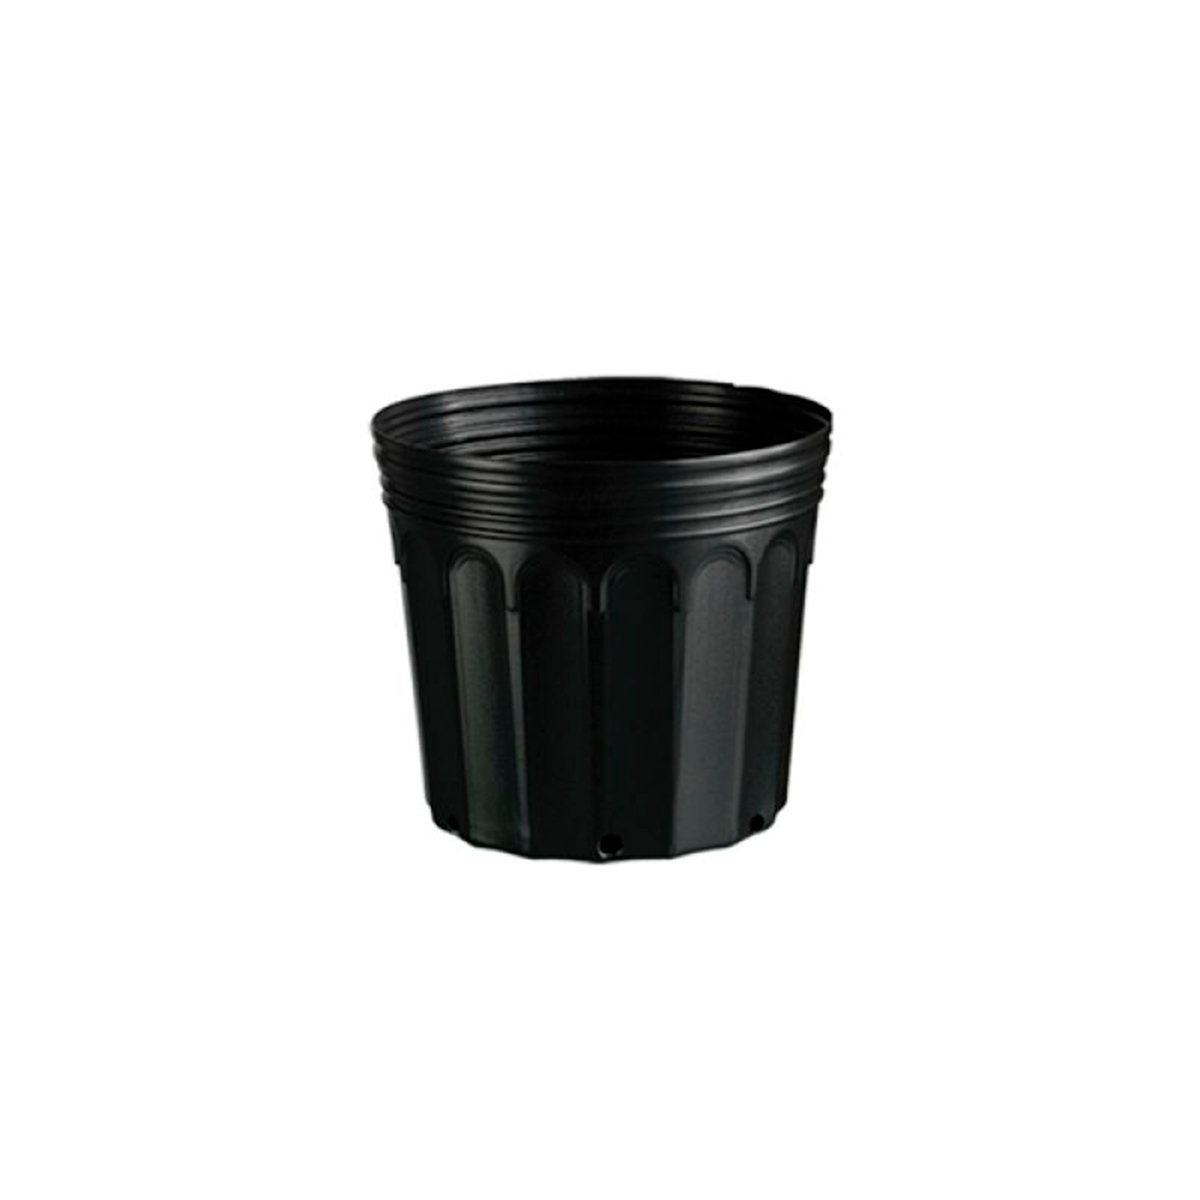 Kit 100 Embalagem para Mudas Flexível Plástico 8,5L